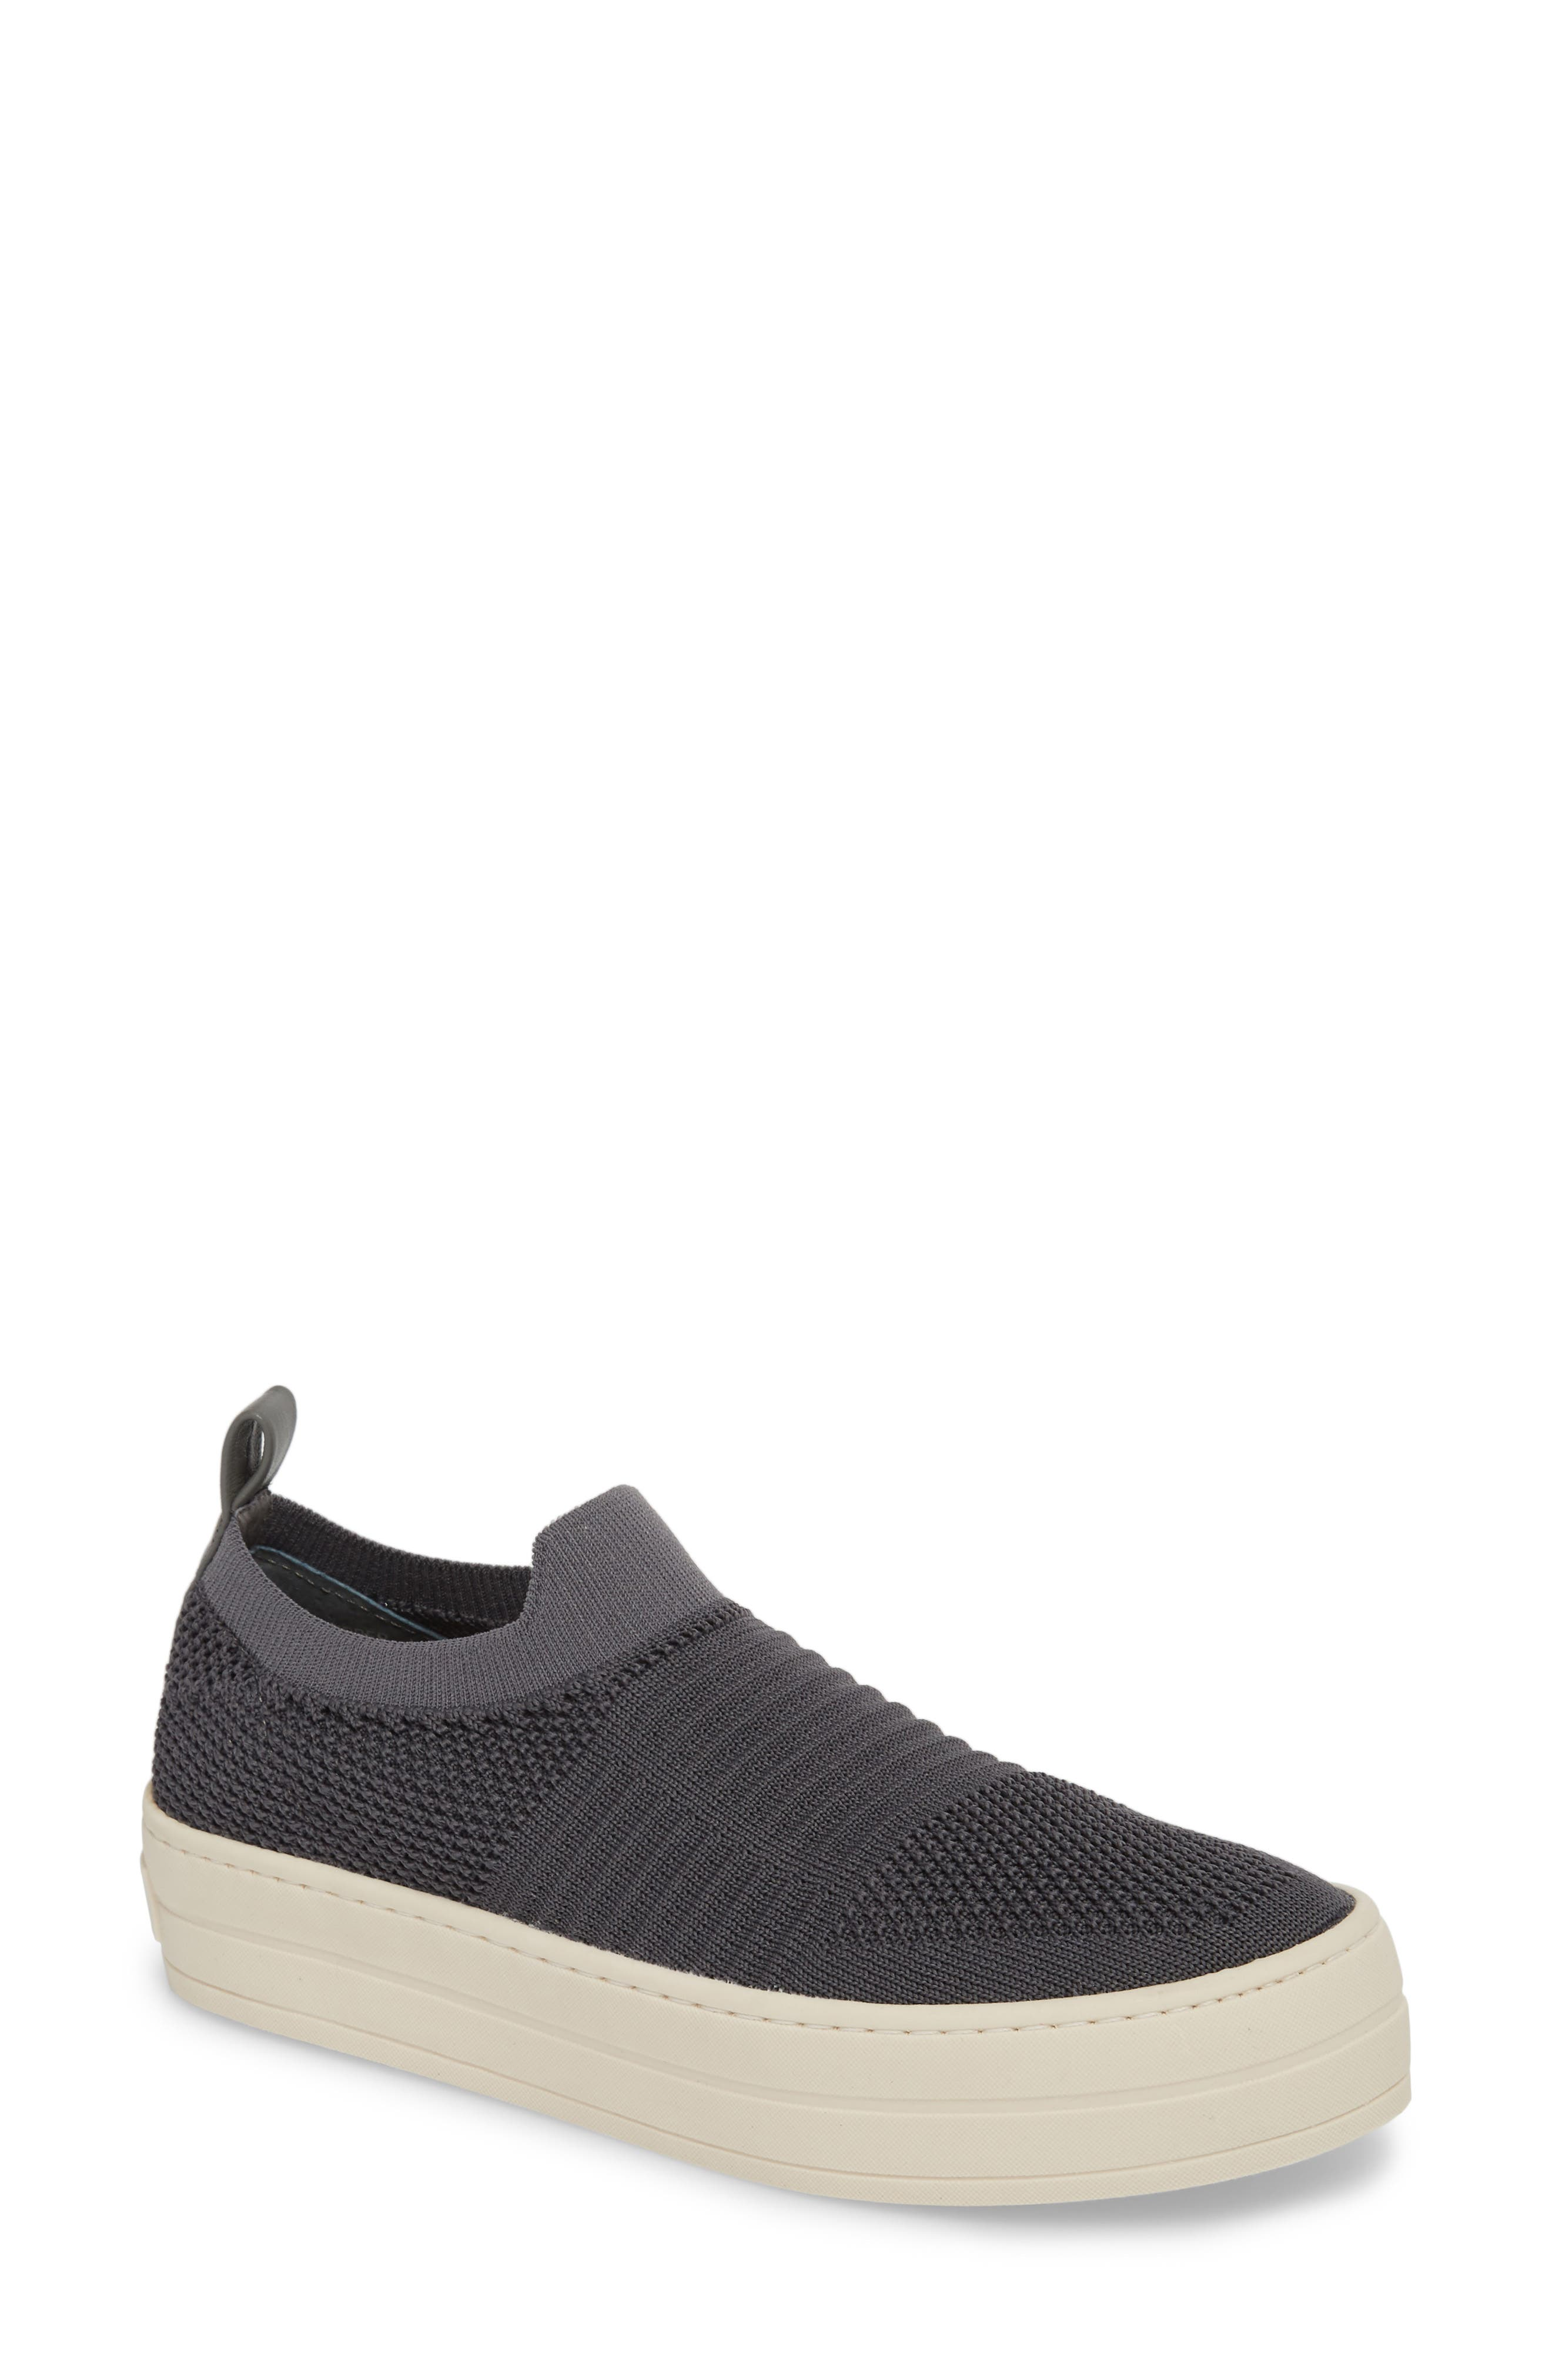 Hilo Platform Slip-On Sneaker,                         Main,                         color, Grey Fabric